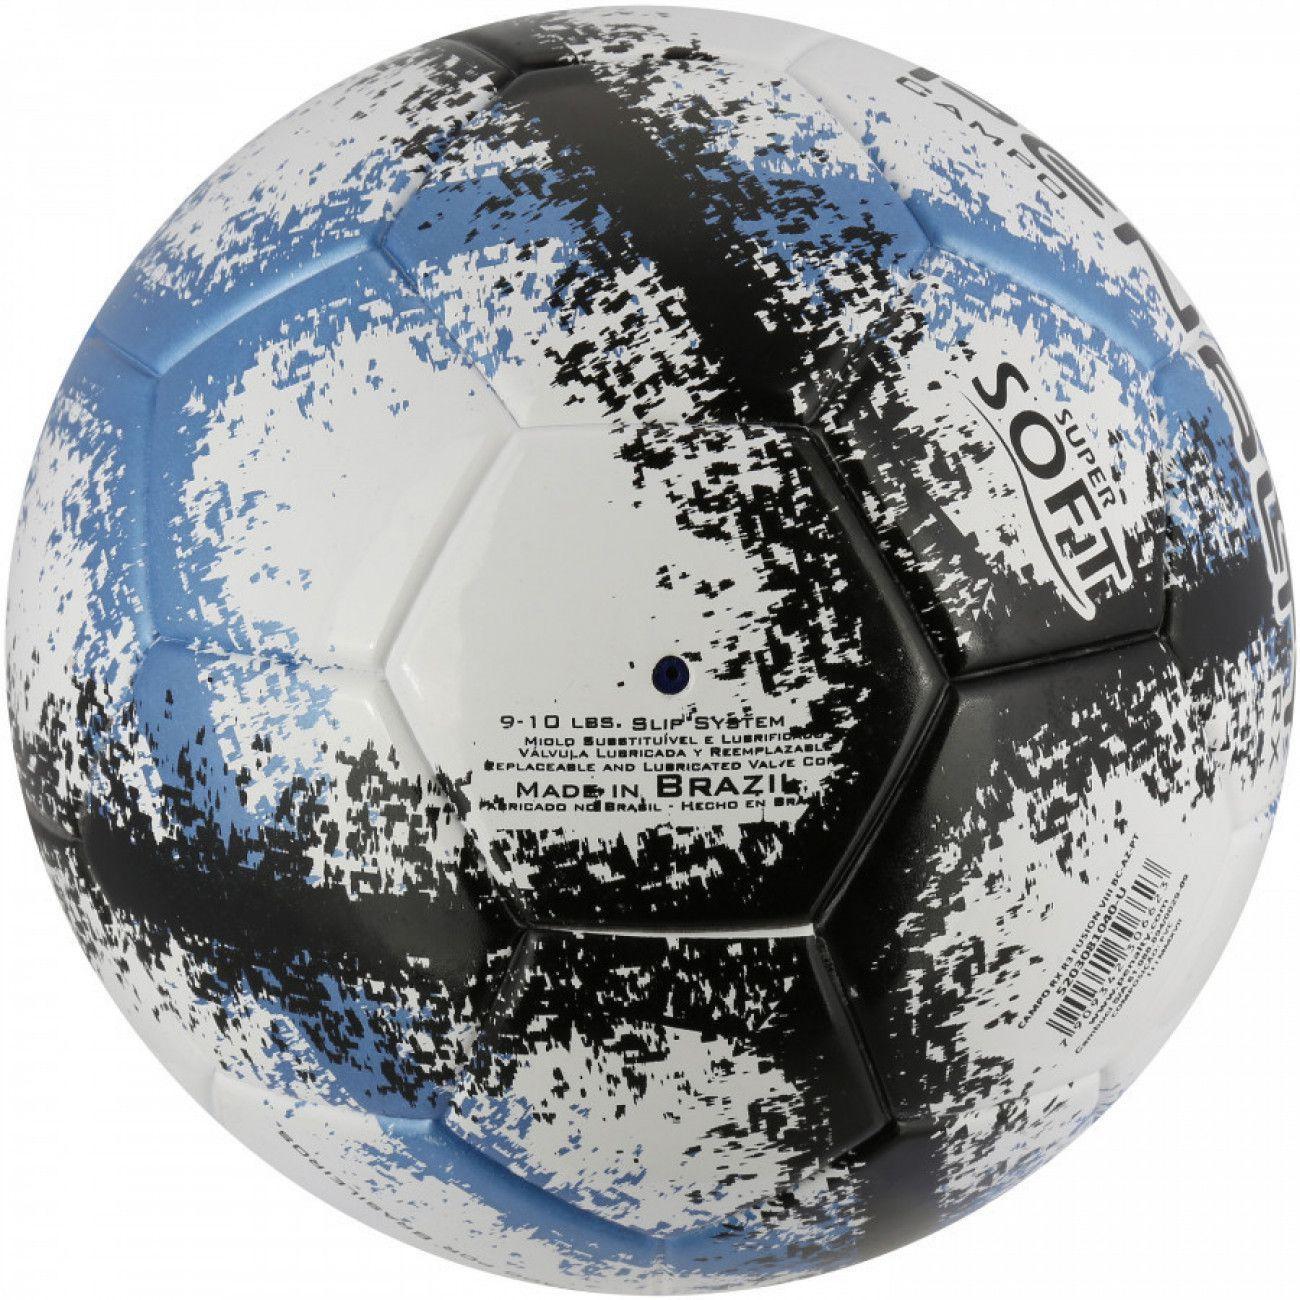 Bola Futebol de Campo Rx R3 Soft Ultra Fusion Azul Penalty - Bolas ... 3a57b1c38044f